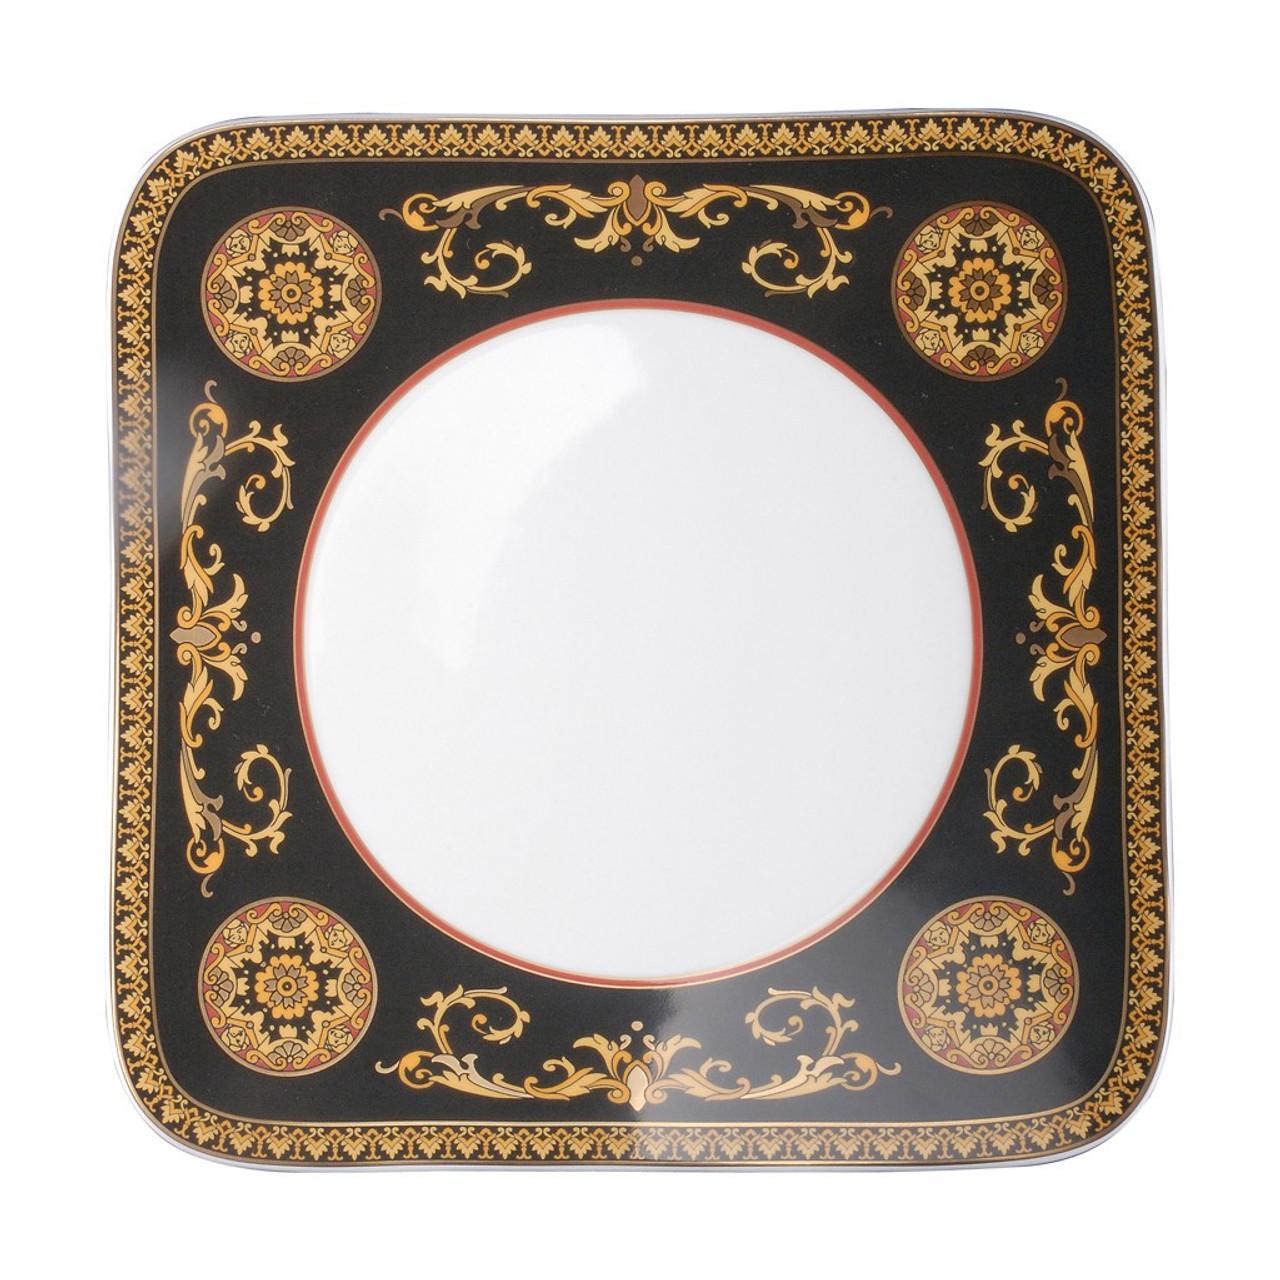 Dinner Plate Square 10 1/2 inch | Versace Medusa Red  sc 1 st  Rosenthal & Dinner Plate Square 10 1/2 inch | Medusa Red| Rosenthal Shop